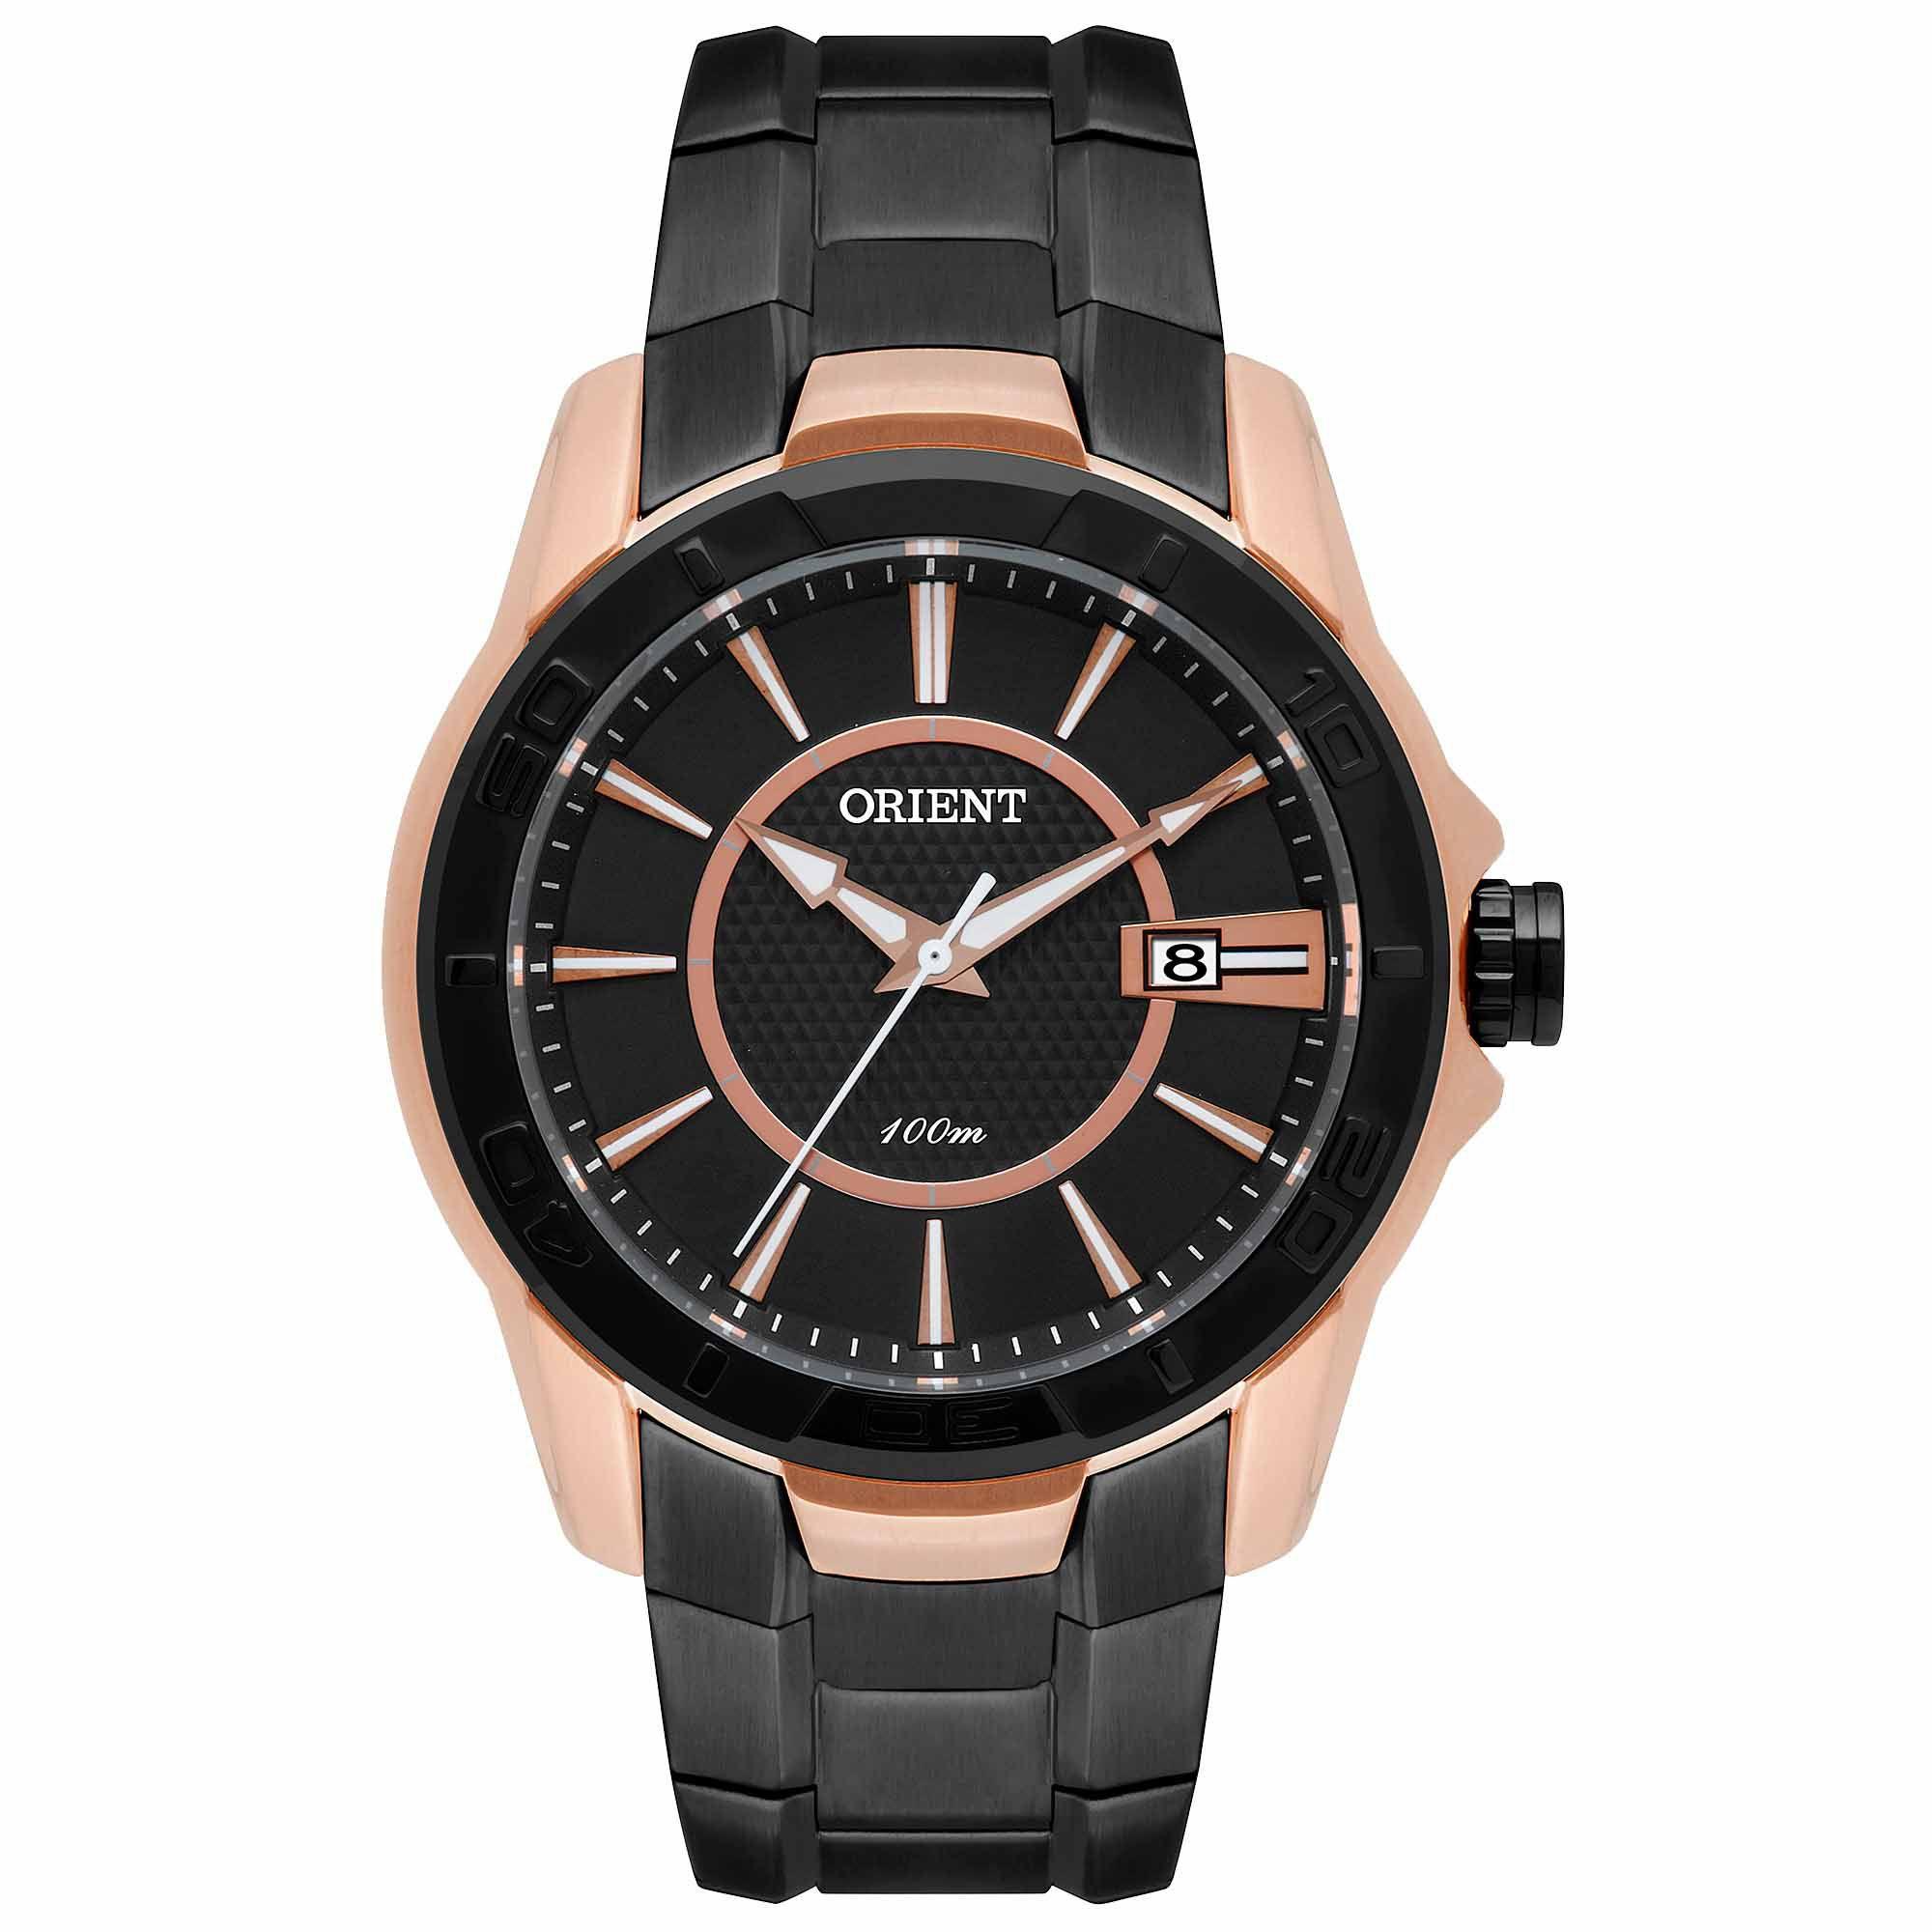 Relógio Masculino Orient MTSS1091 P1PK